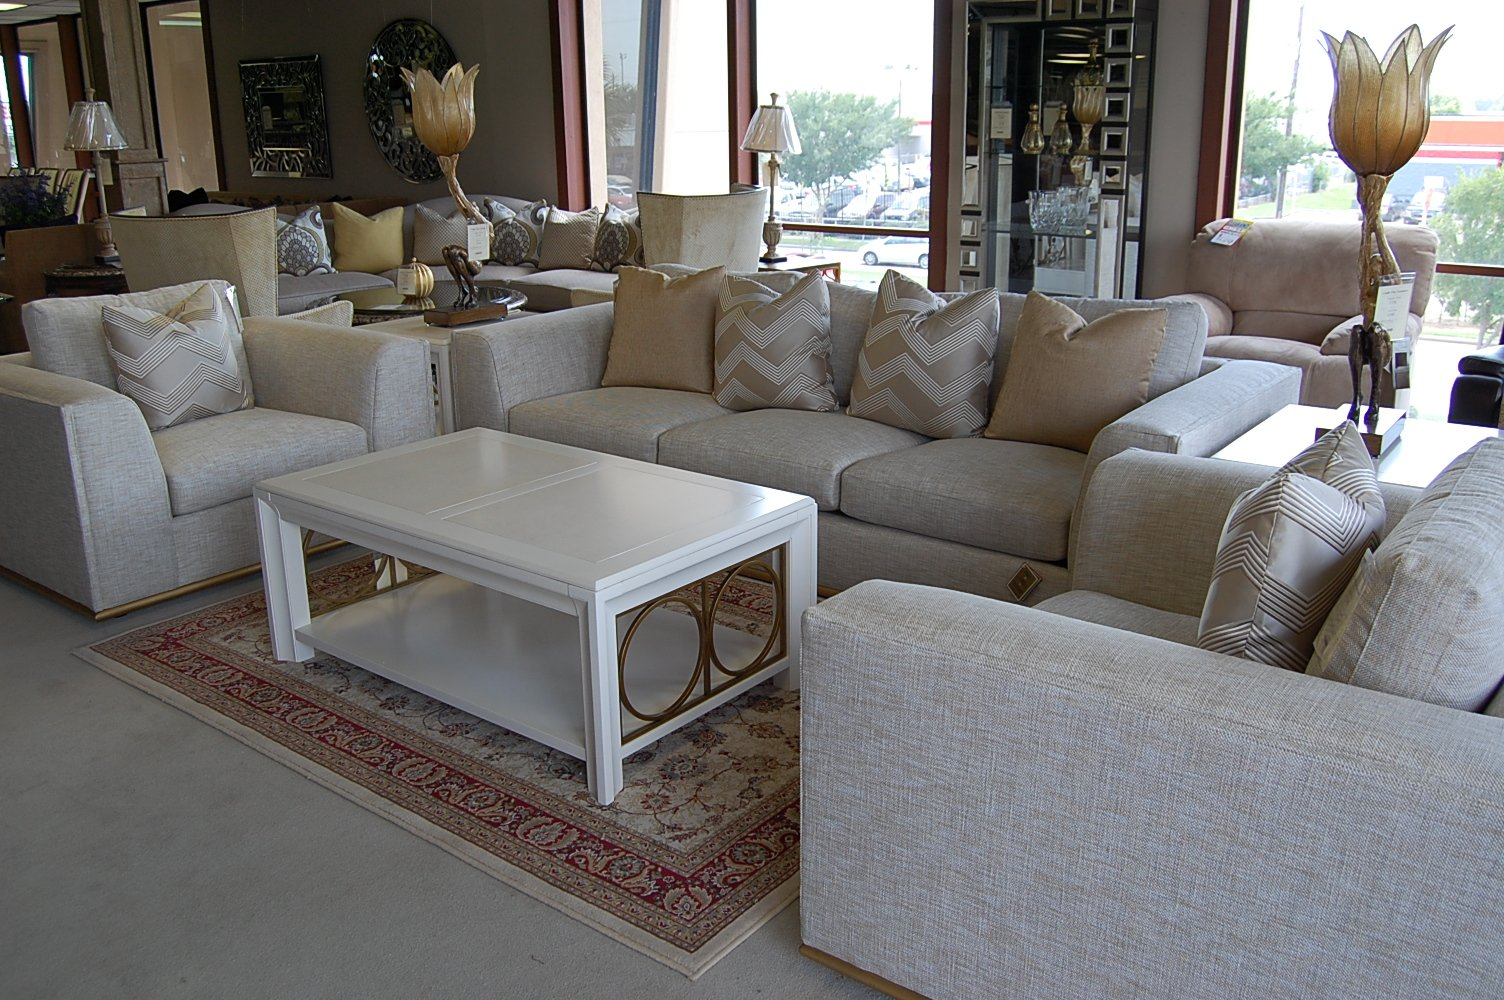 sofas houston sale raymond and flanigan furniture sofa bed living room tx luxury